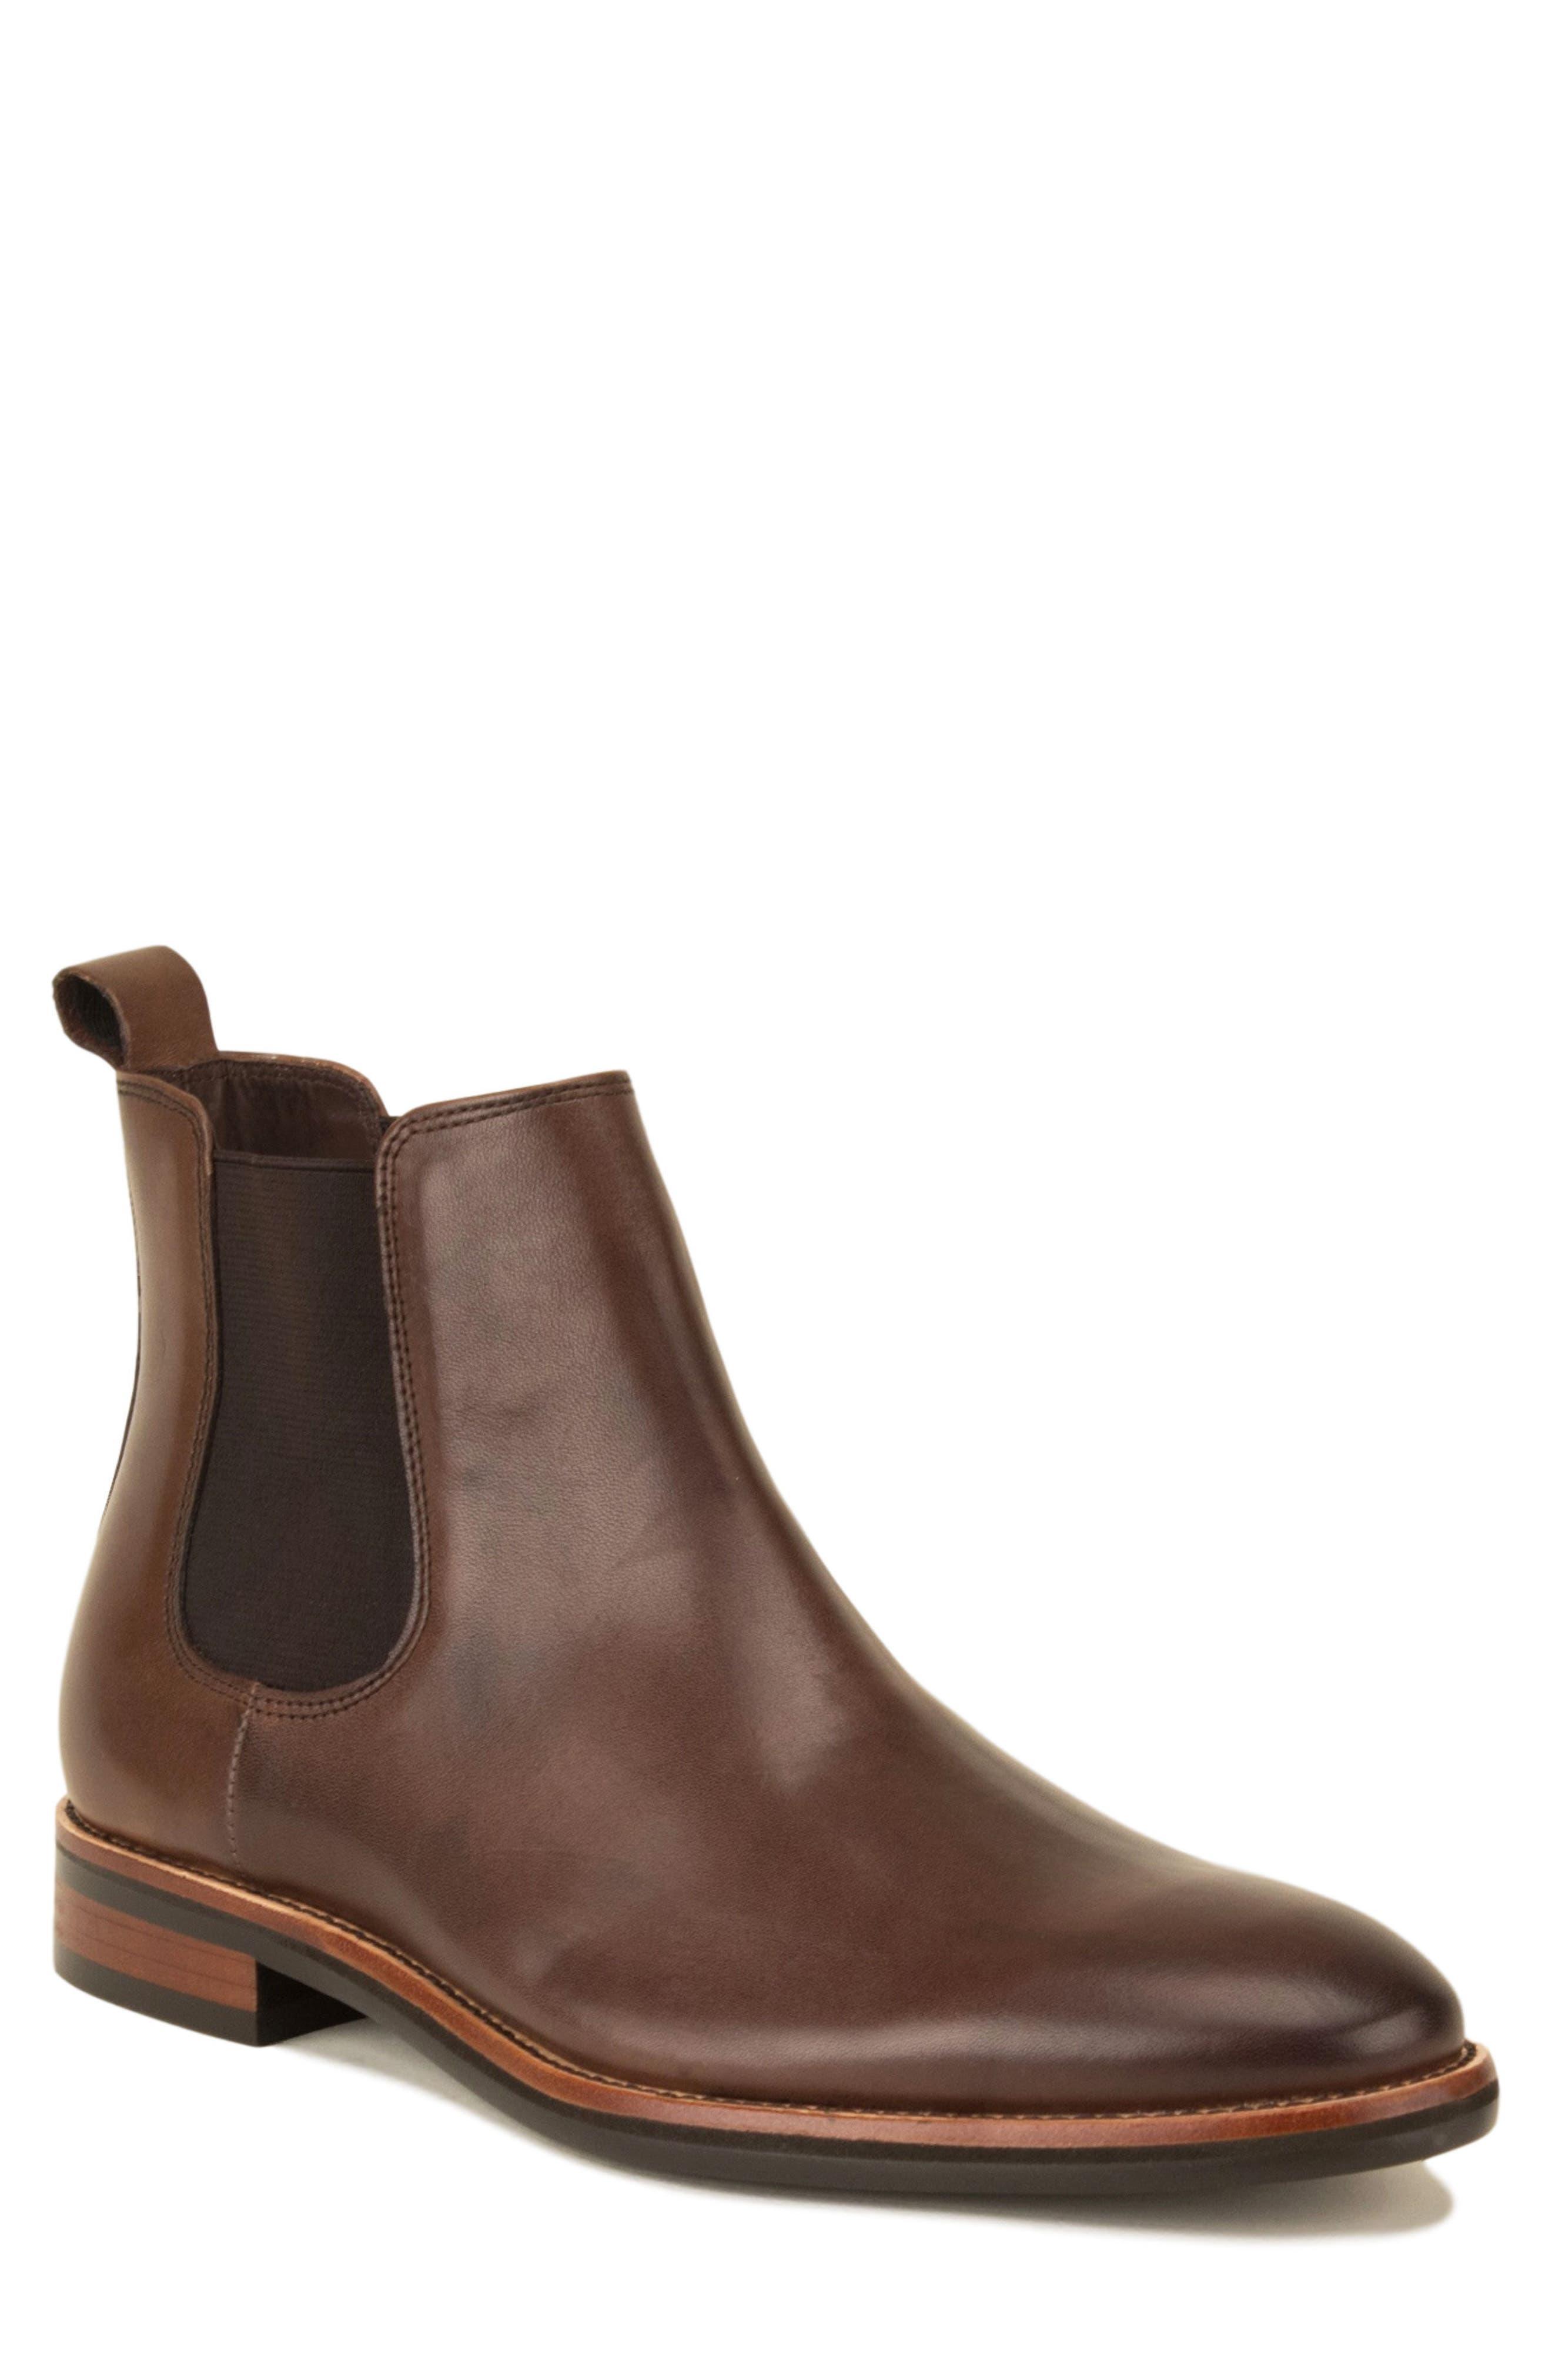 'Wallis' Chelsea Boot,                         Main,                         color, 217